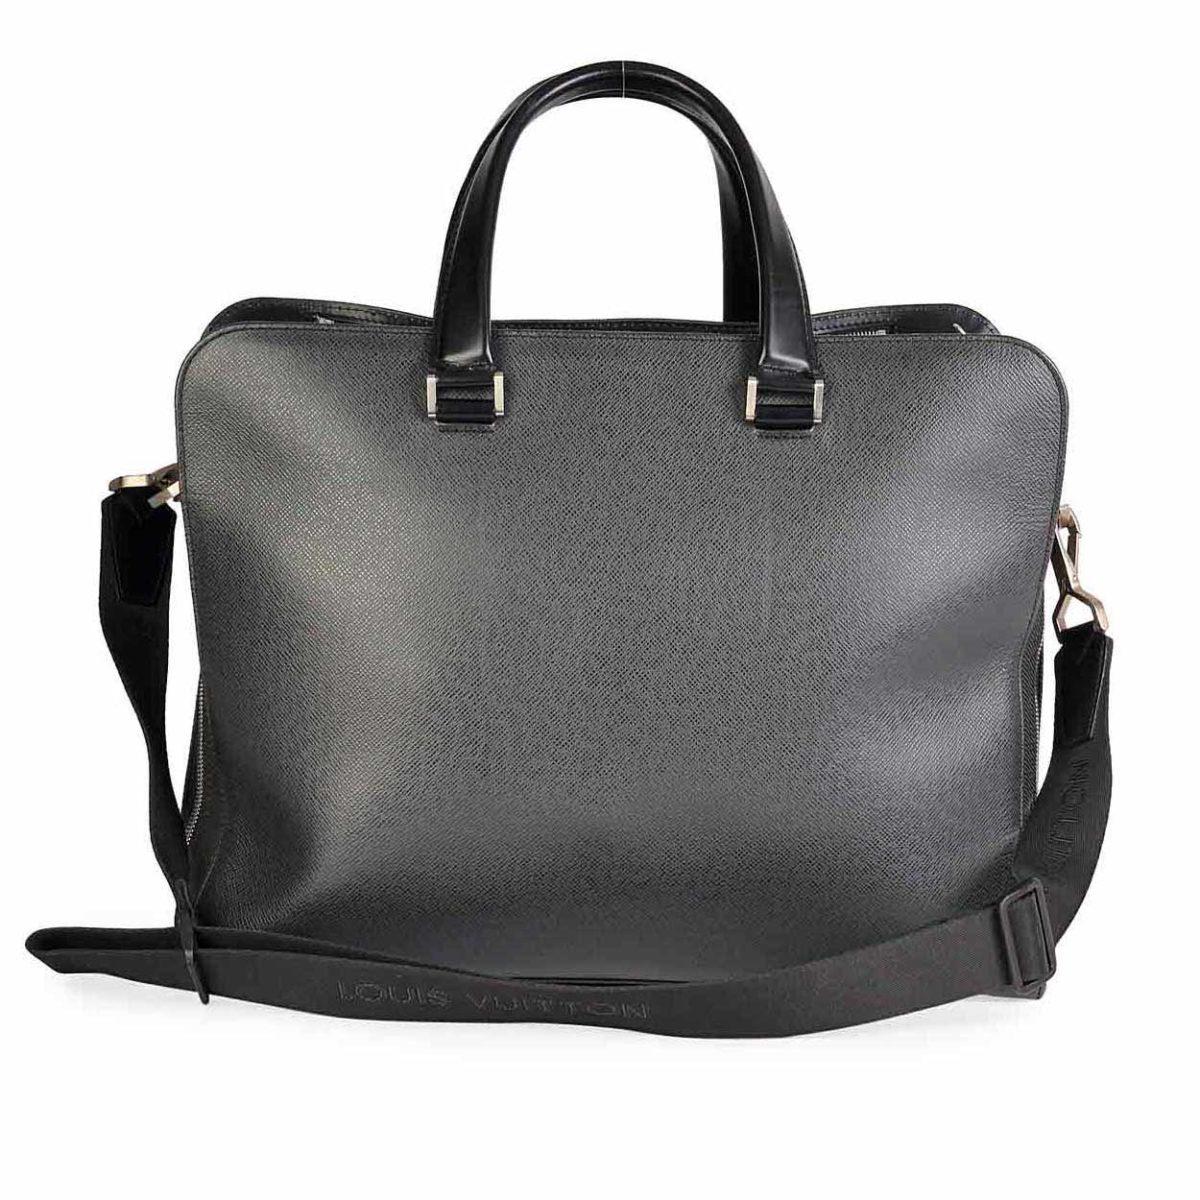 ef0f146d9a33 LOUIS VUITTON Black Taiga Briefcase